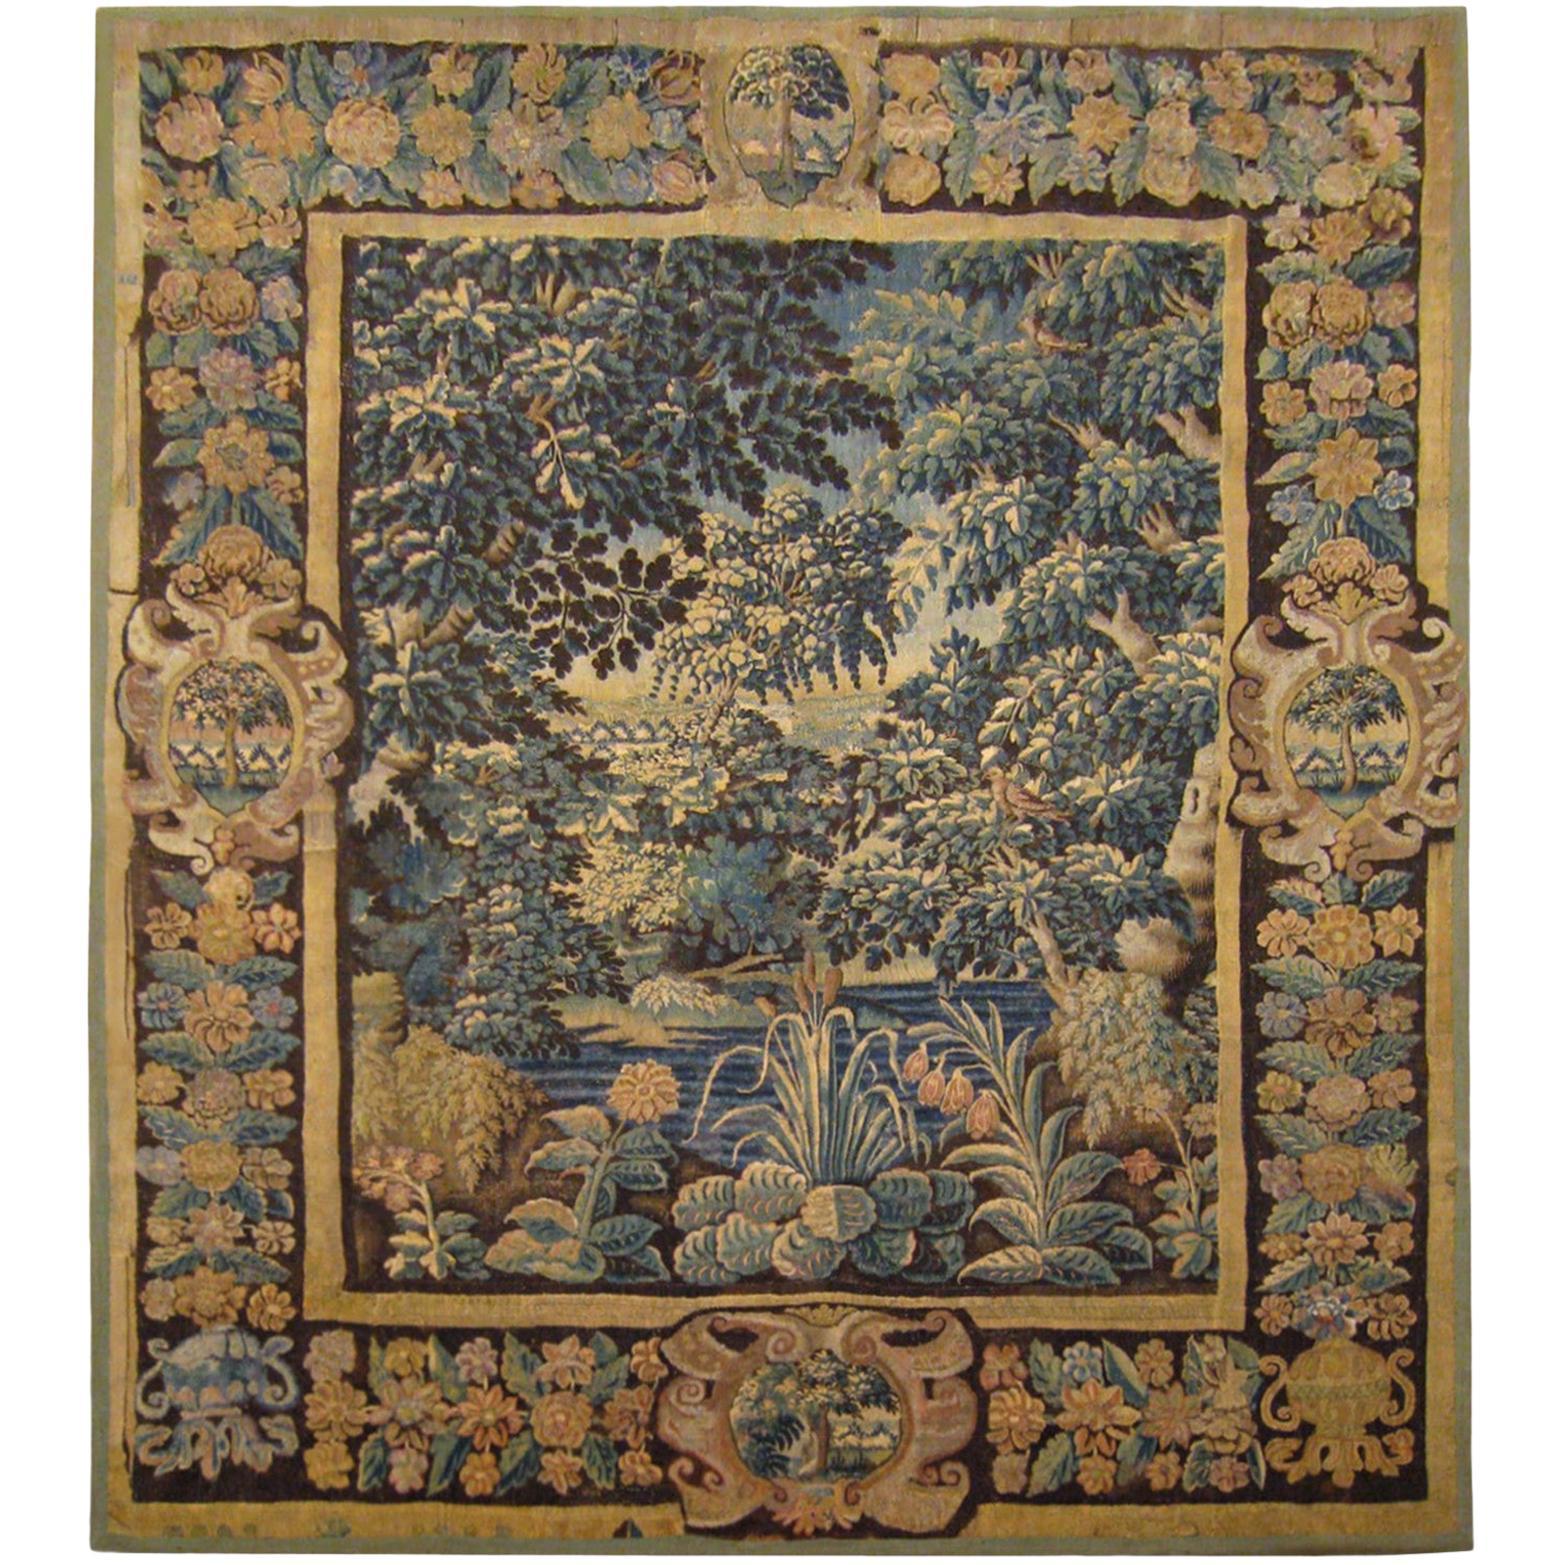 17th Century Flemish Verdure Landscape Tapestry, a Lush Forest & Pendant Border